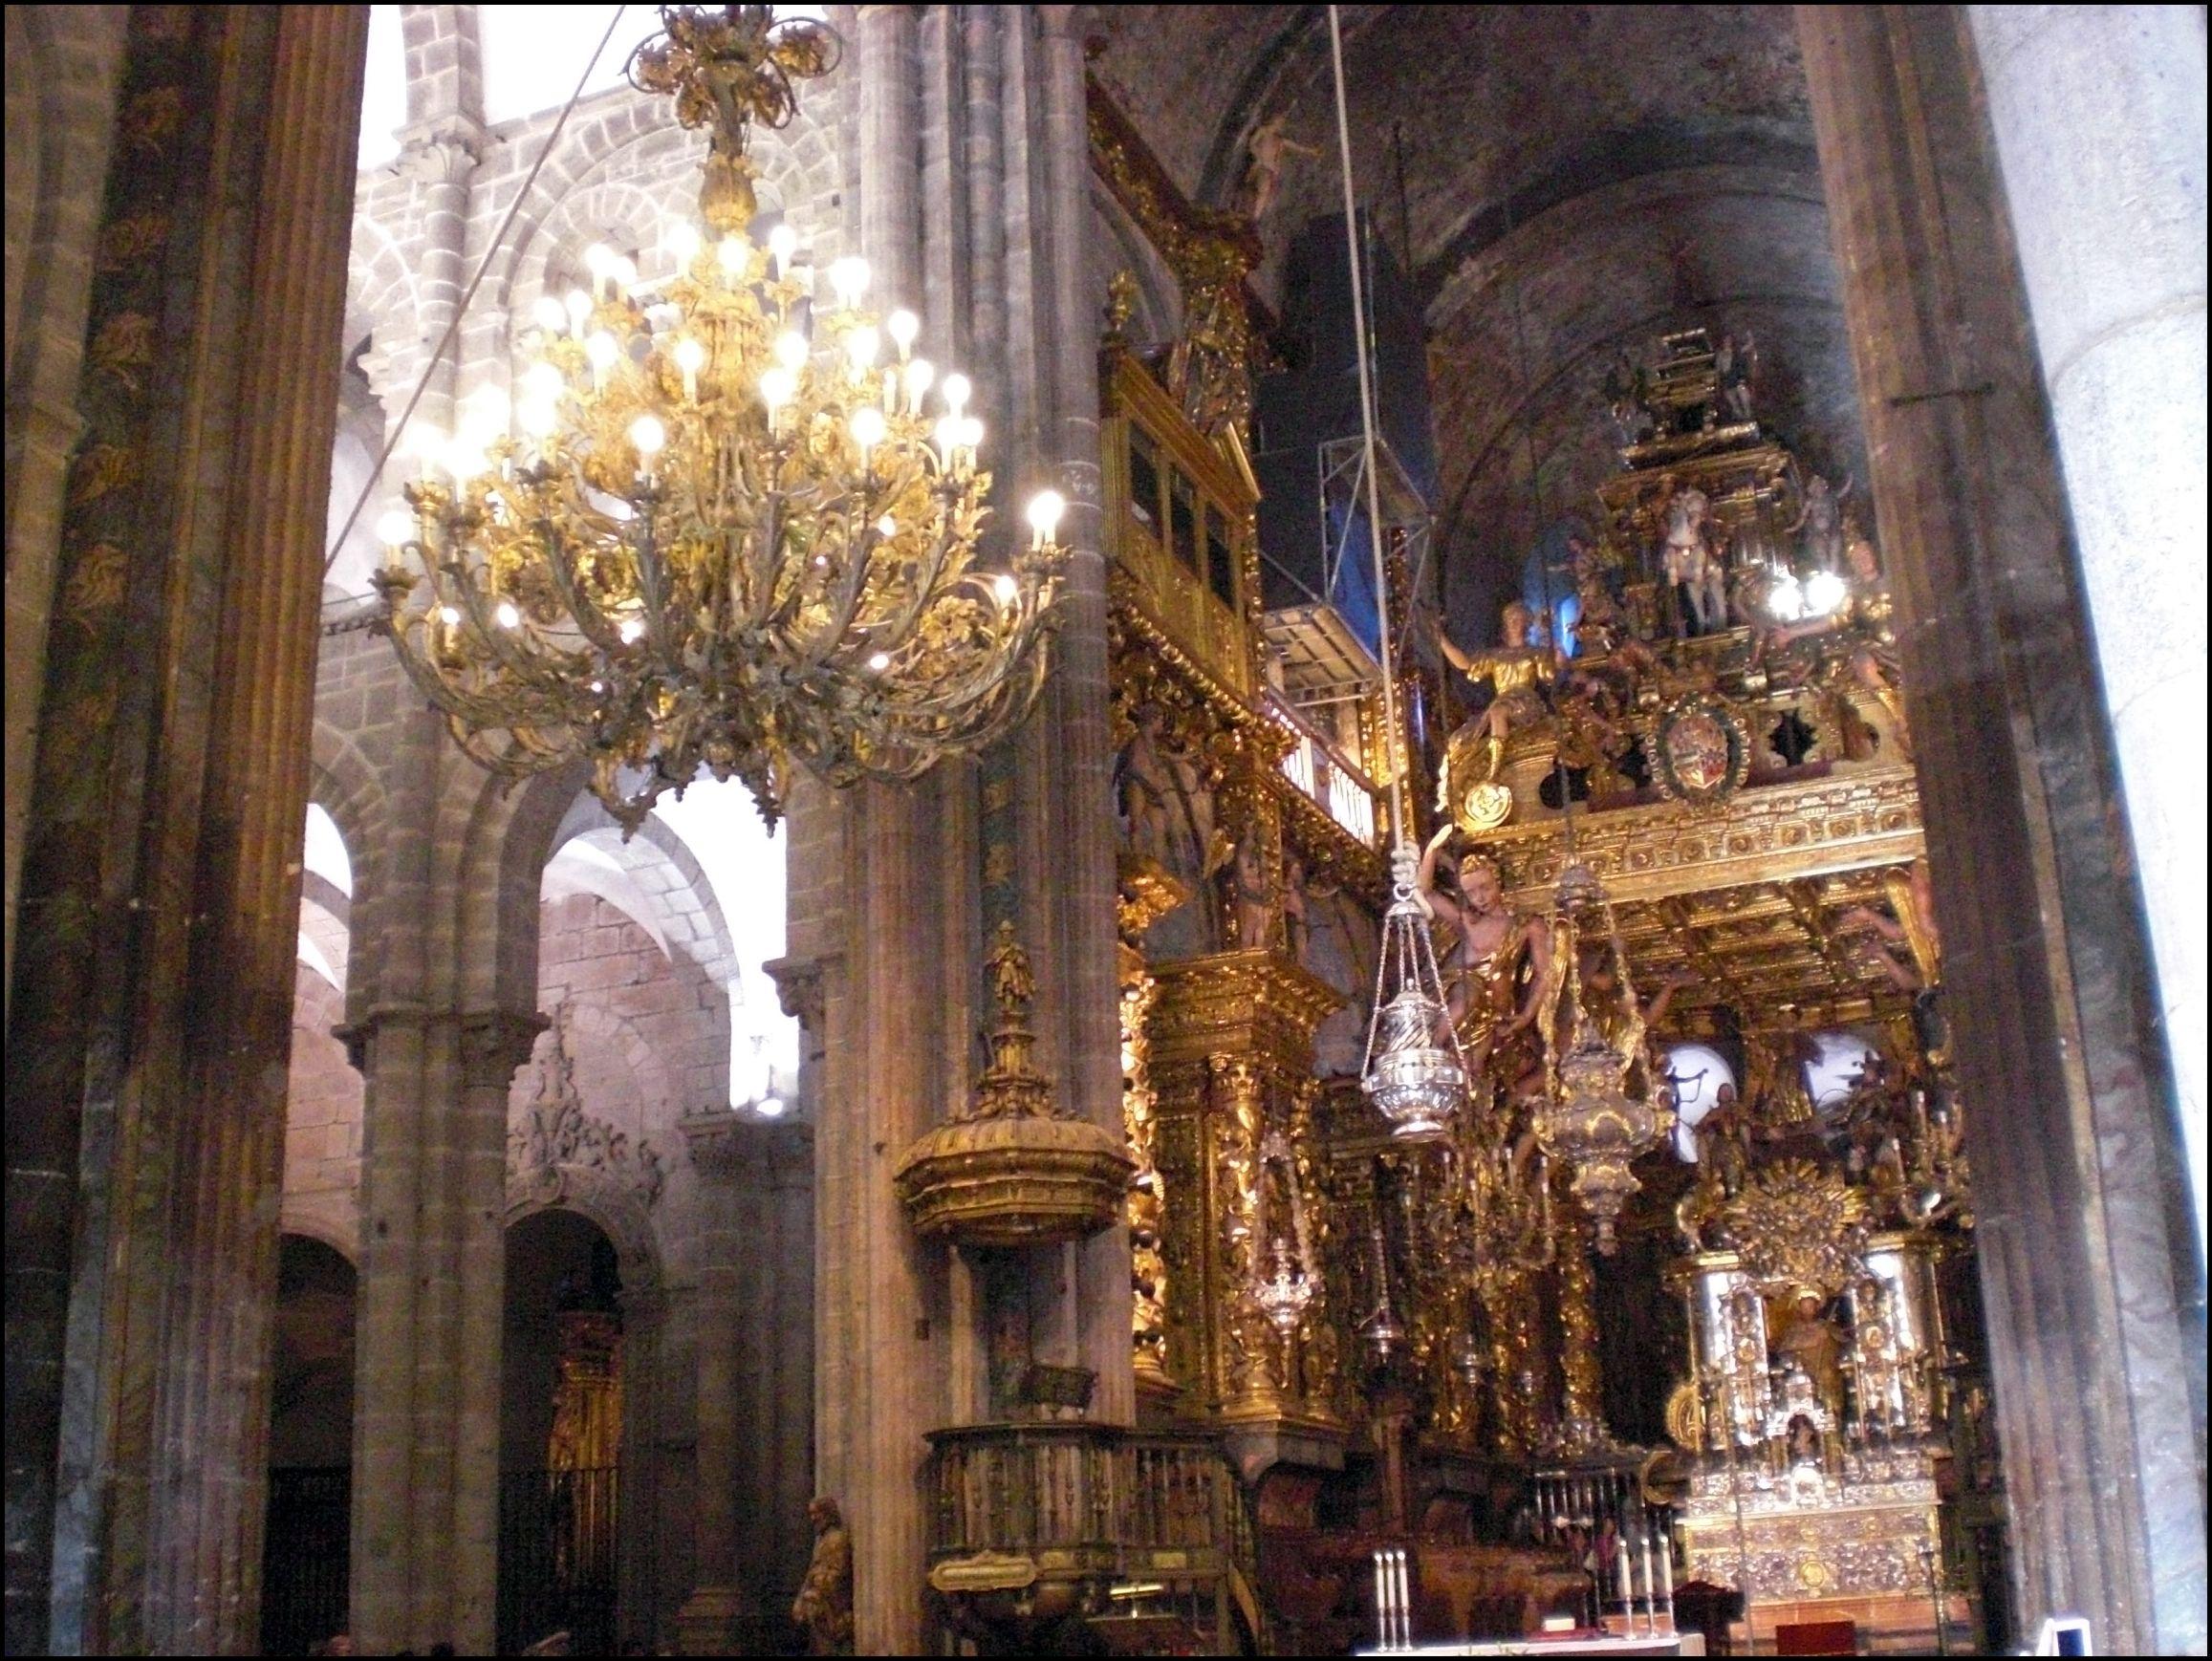 Interior catedral santiago de compostela turismo en - Interior santiago de compostela ...